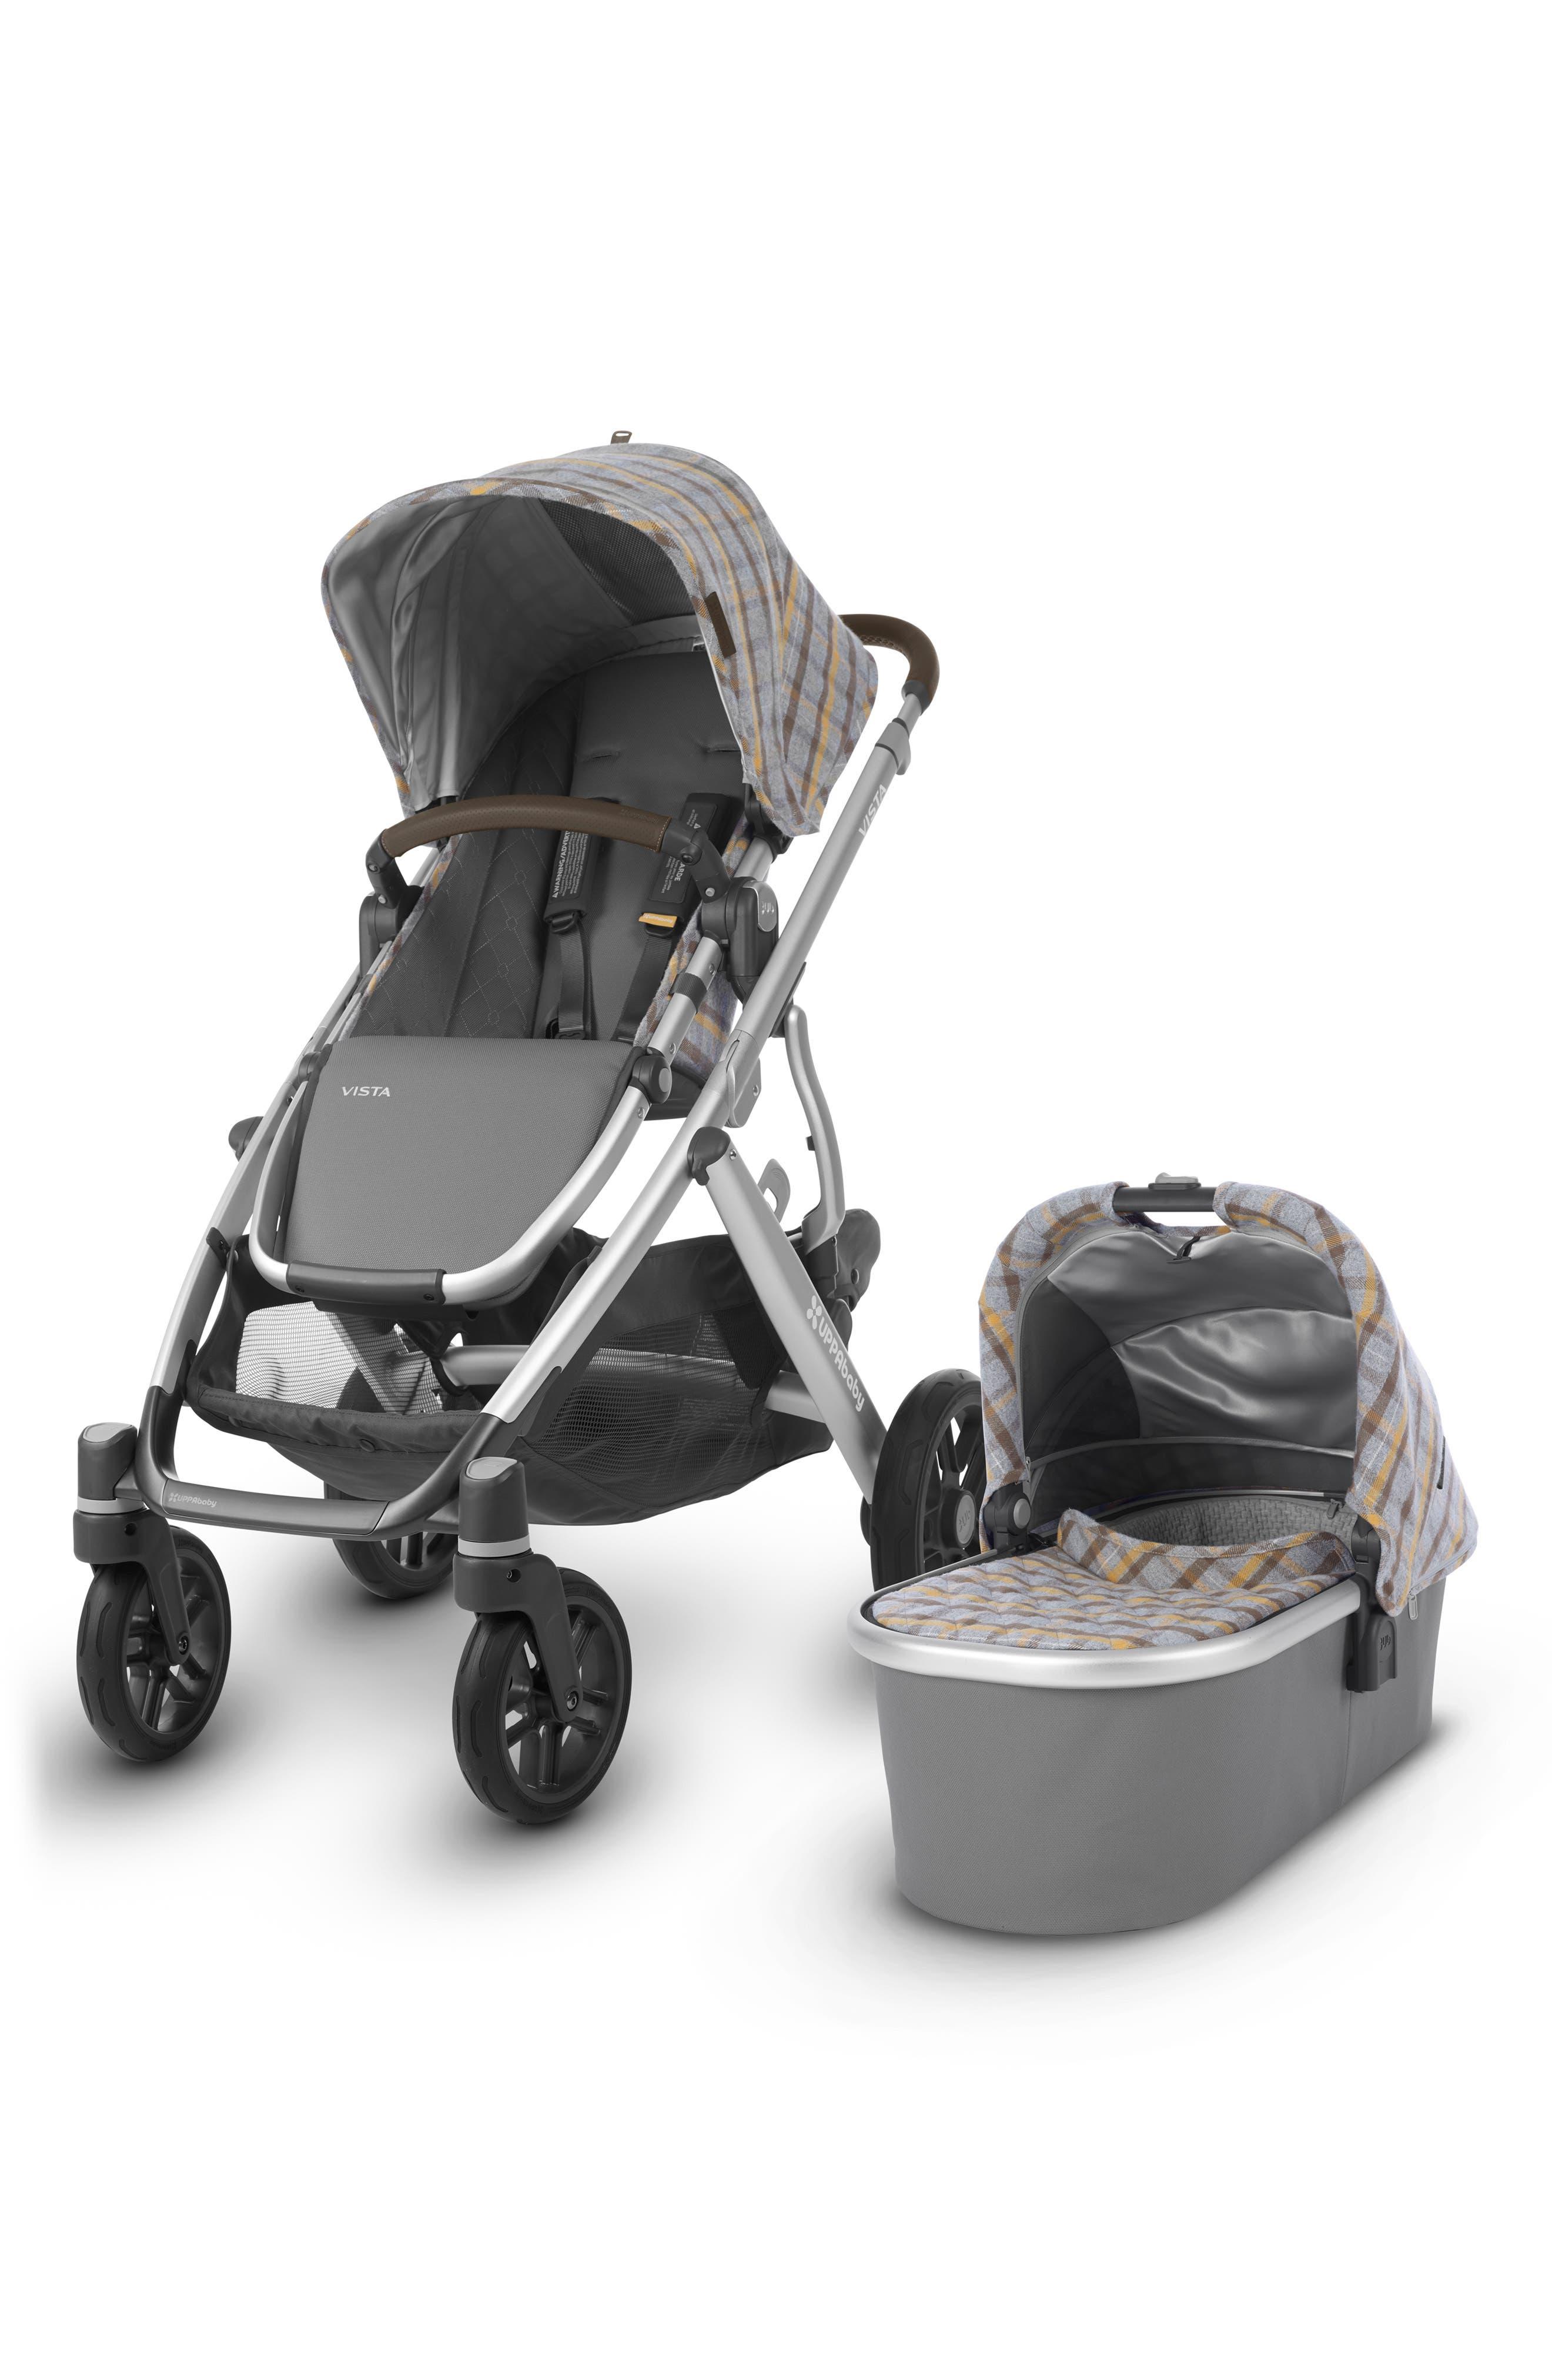 VISTA Spenser Convertible Stroller with Bassinet & Toddler Seat,                             Main thumbnail 1, color,                             GREY/ YELLOW TARTAN